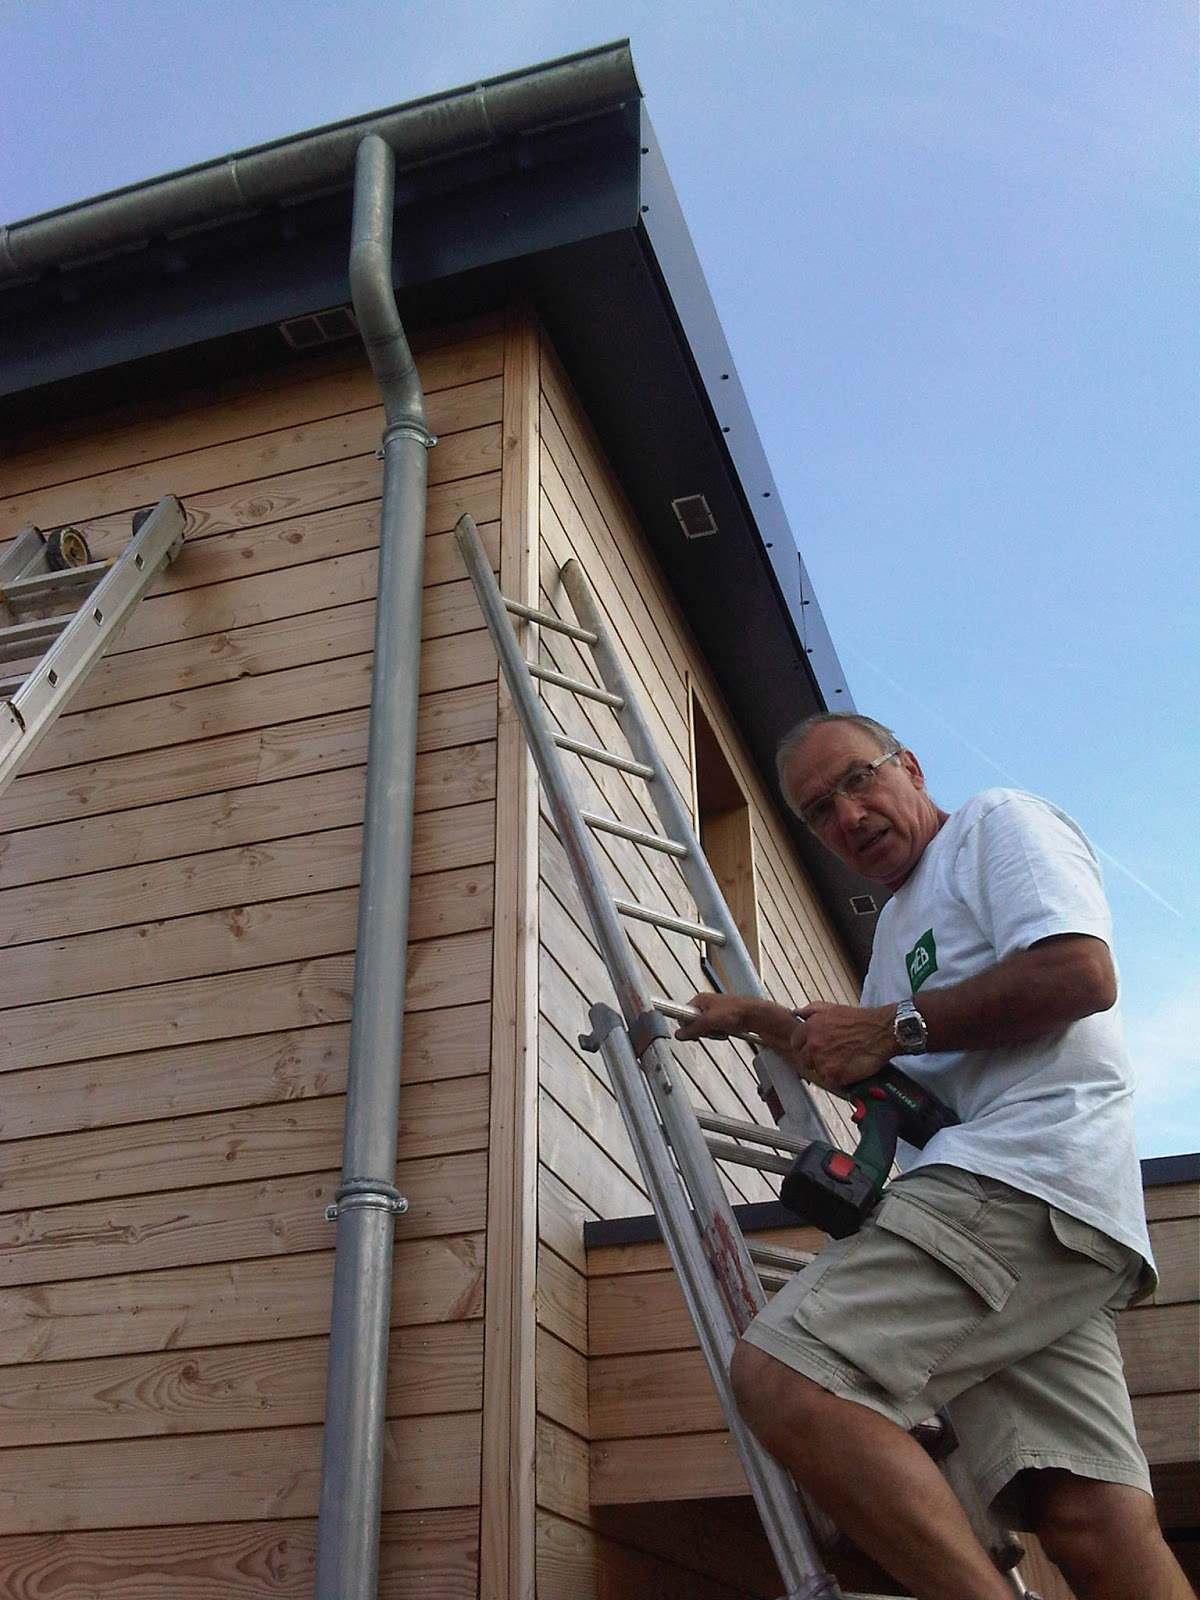 My mob dream debord de toit finish - Debord de toit ...